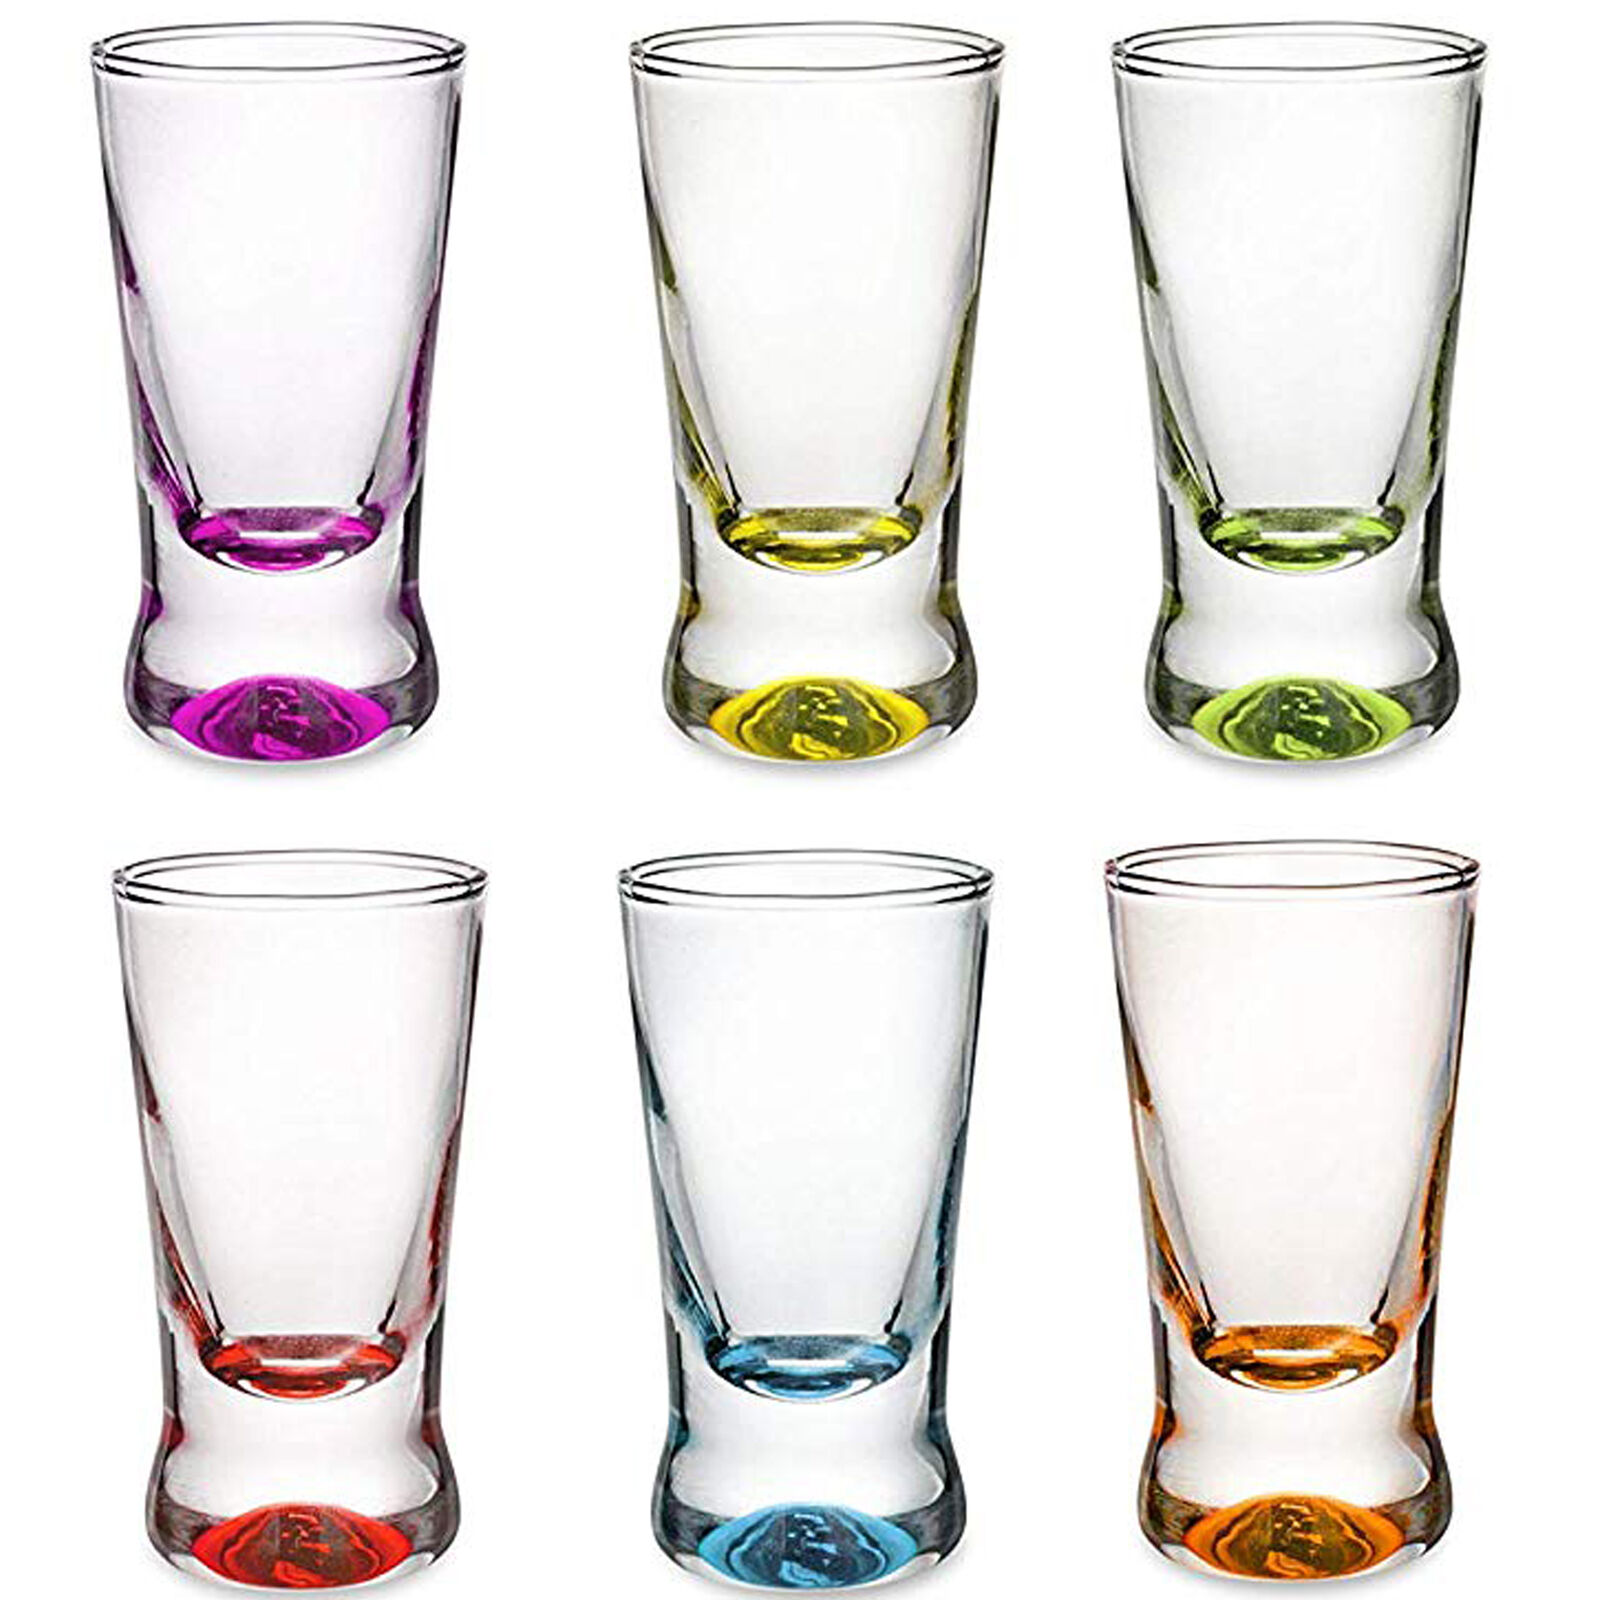 Shotgläser Set 6 Teilig bunt Schnapsgläser 2,5cl Wodkagläser Pinnchen aus Glas